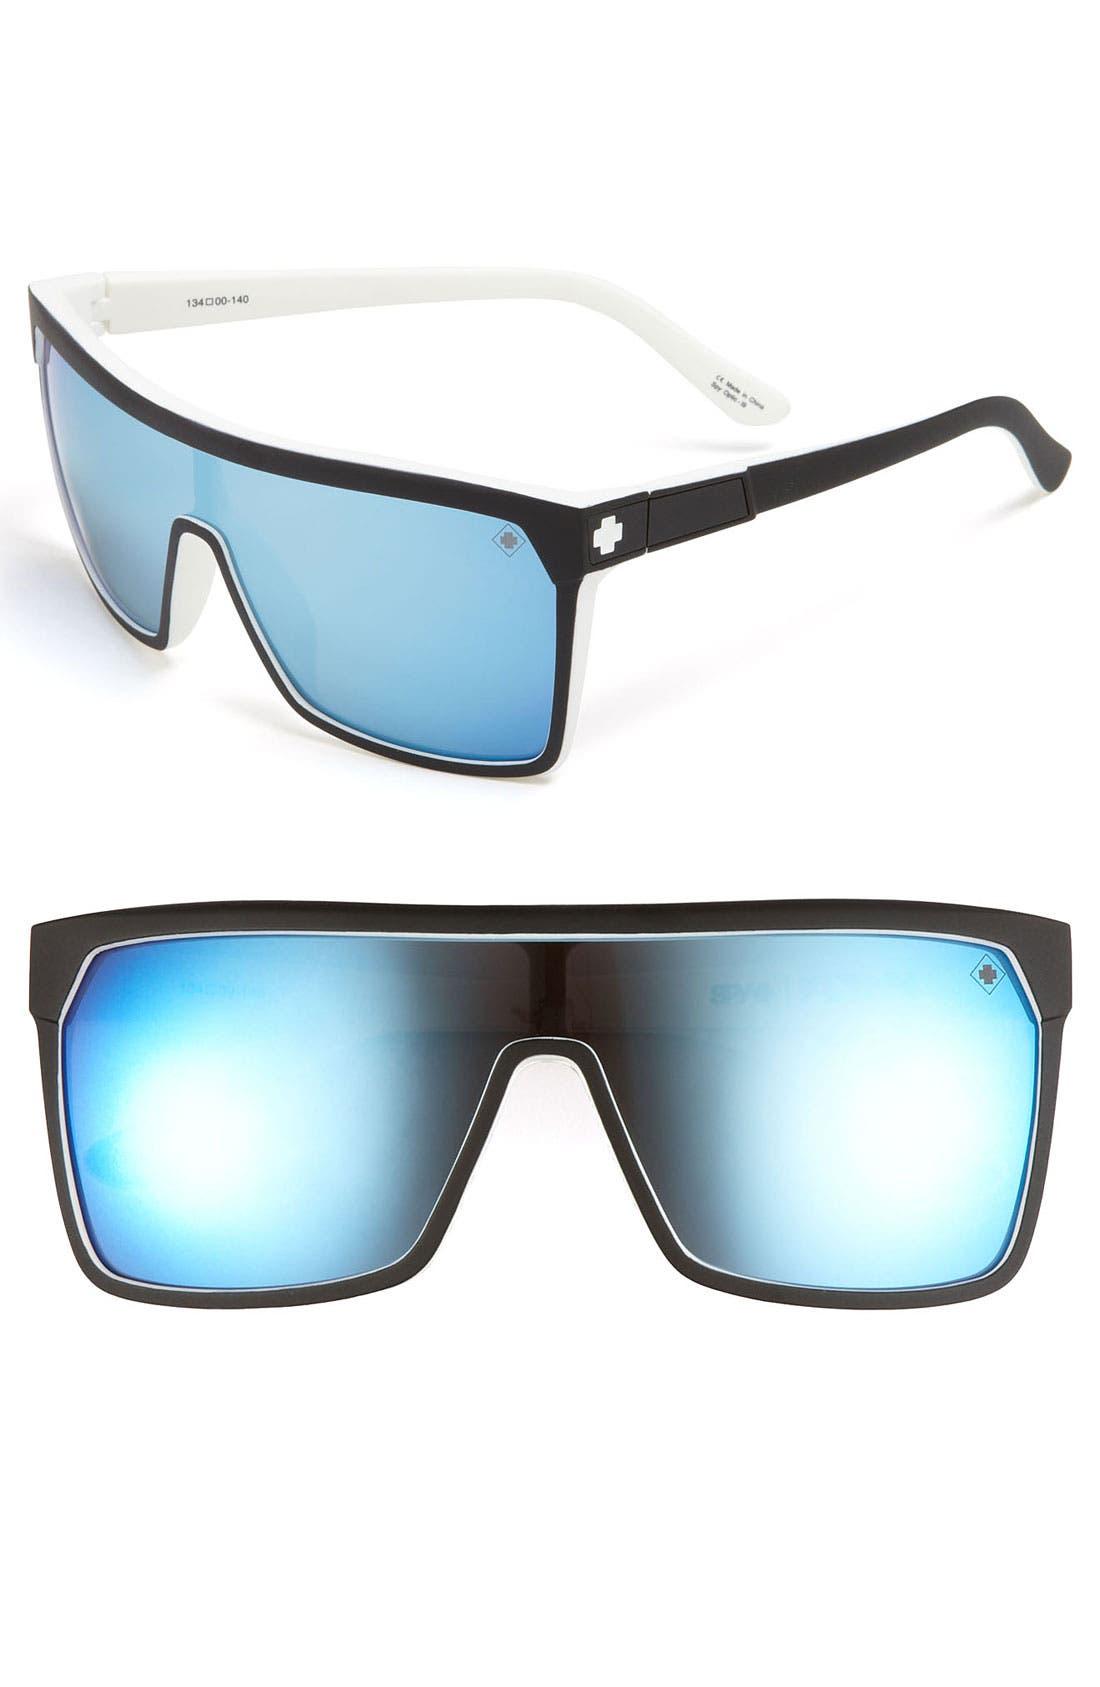 Main Image - SPY Optic 'Whitewall Series - Flynn' Sunglasses